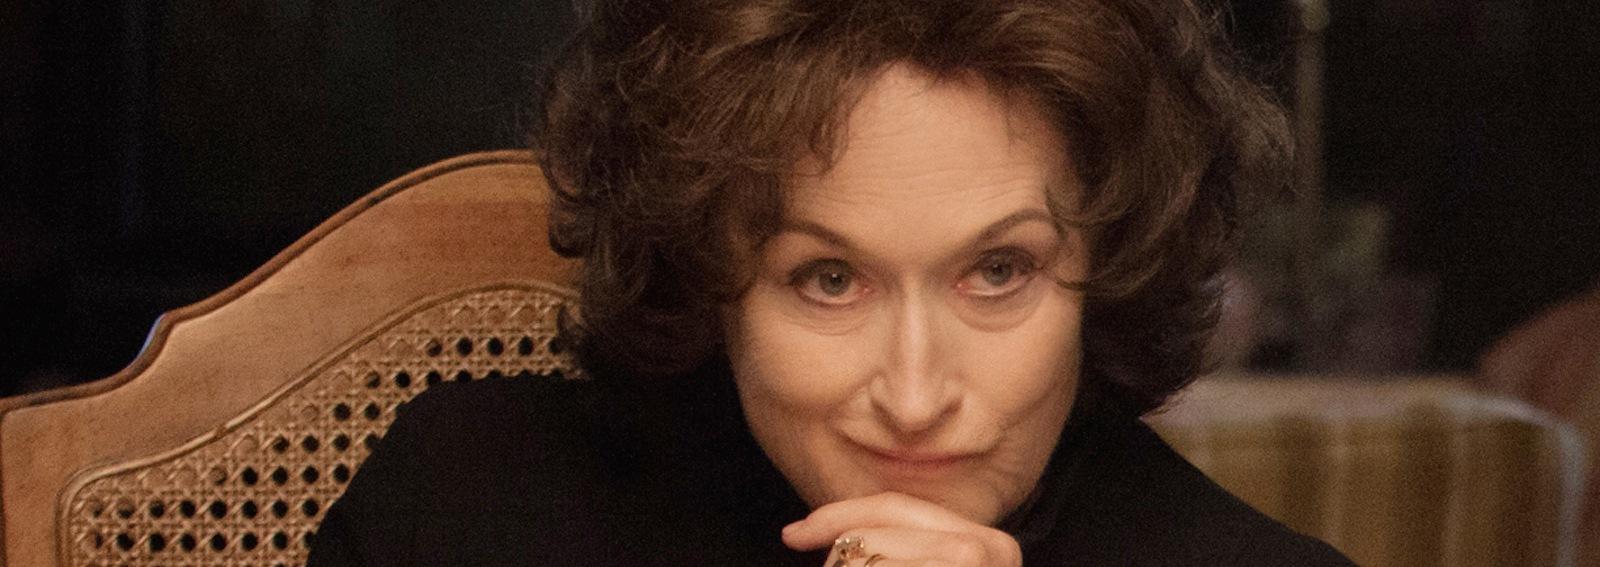 Meryl Streep capelli scuri